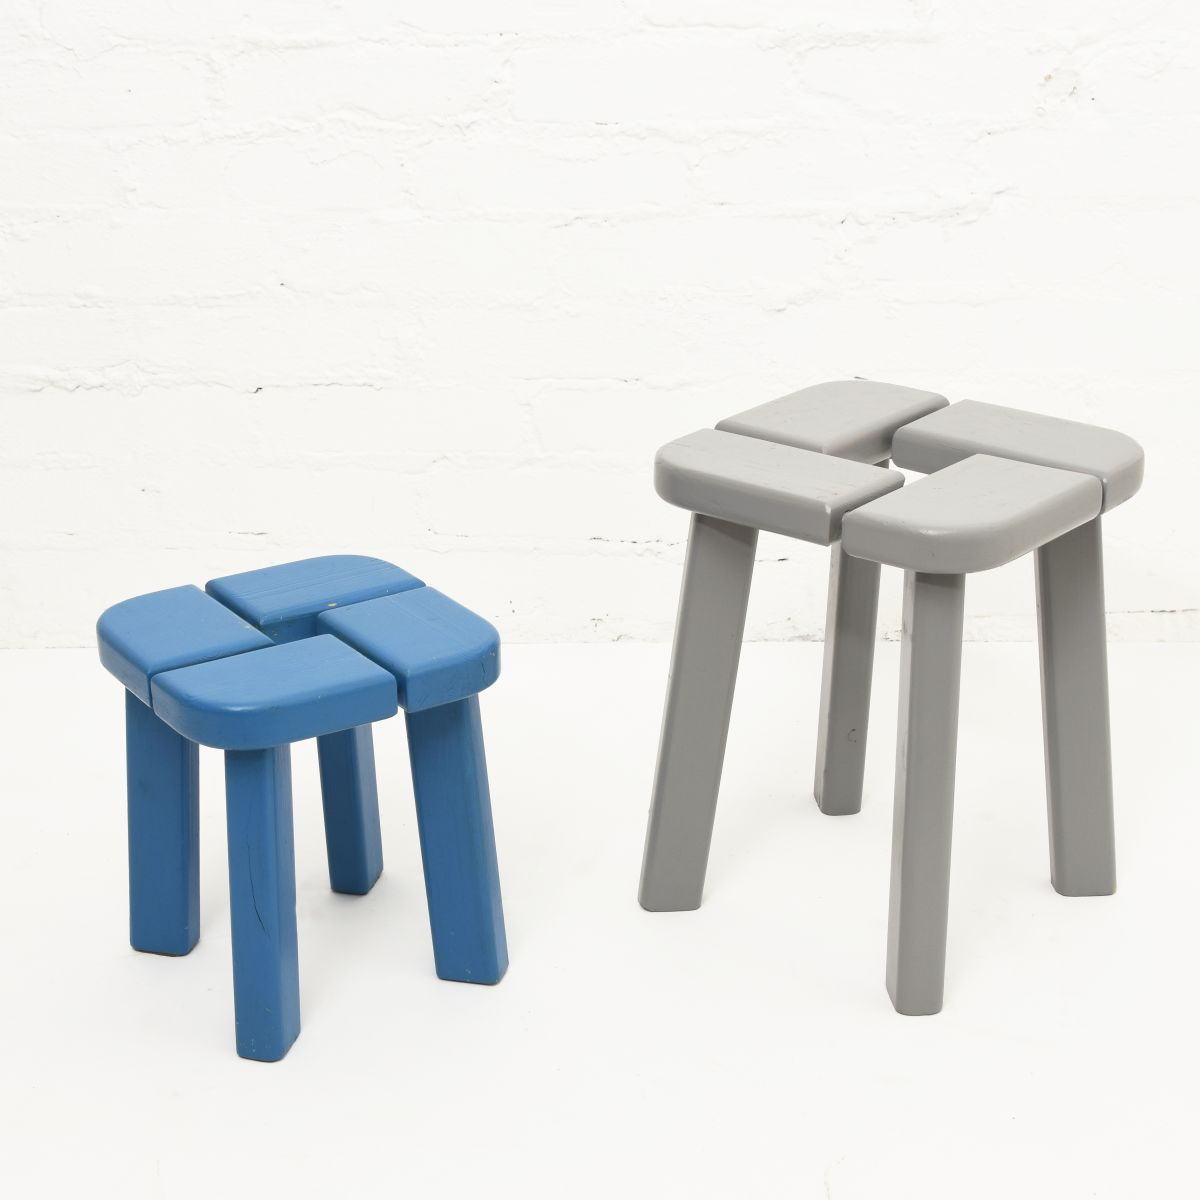 Wooden-Stool-Blue-Gray